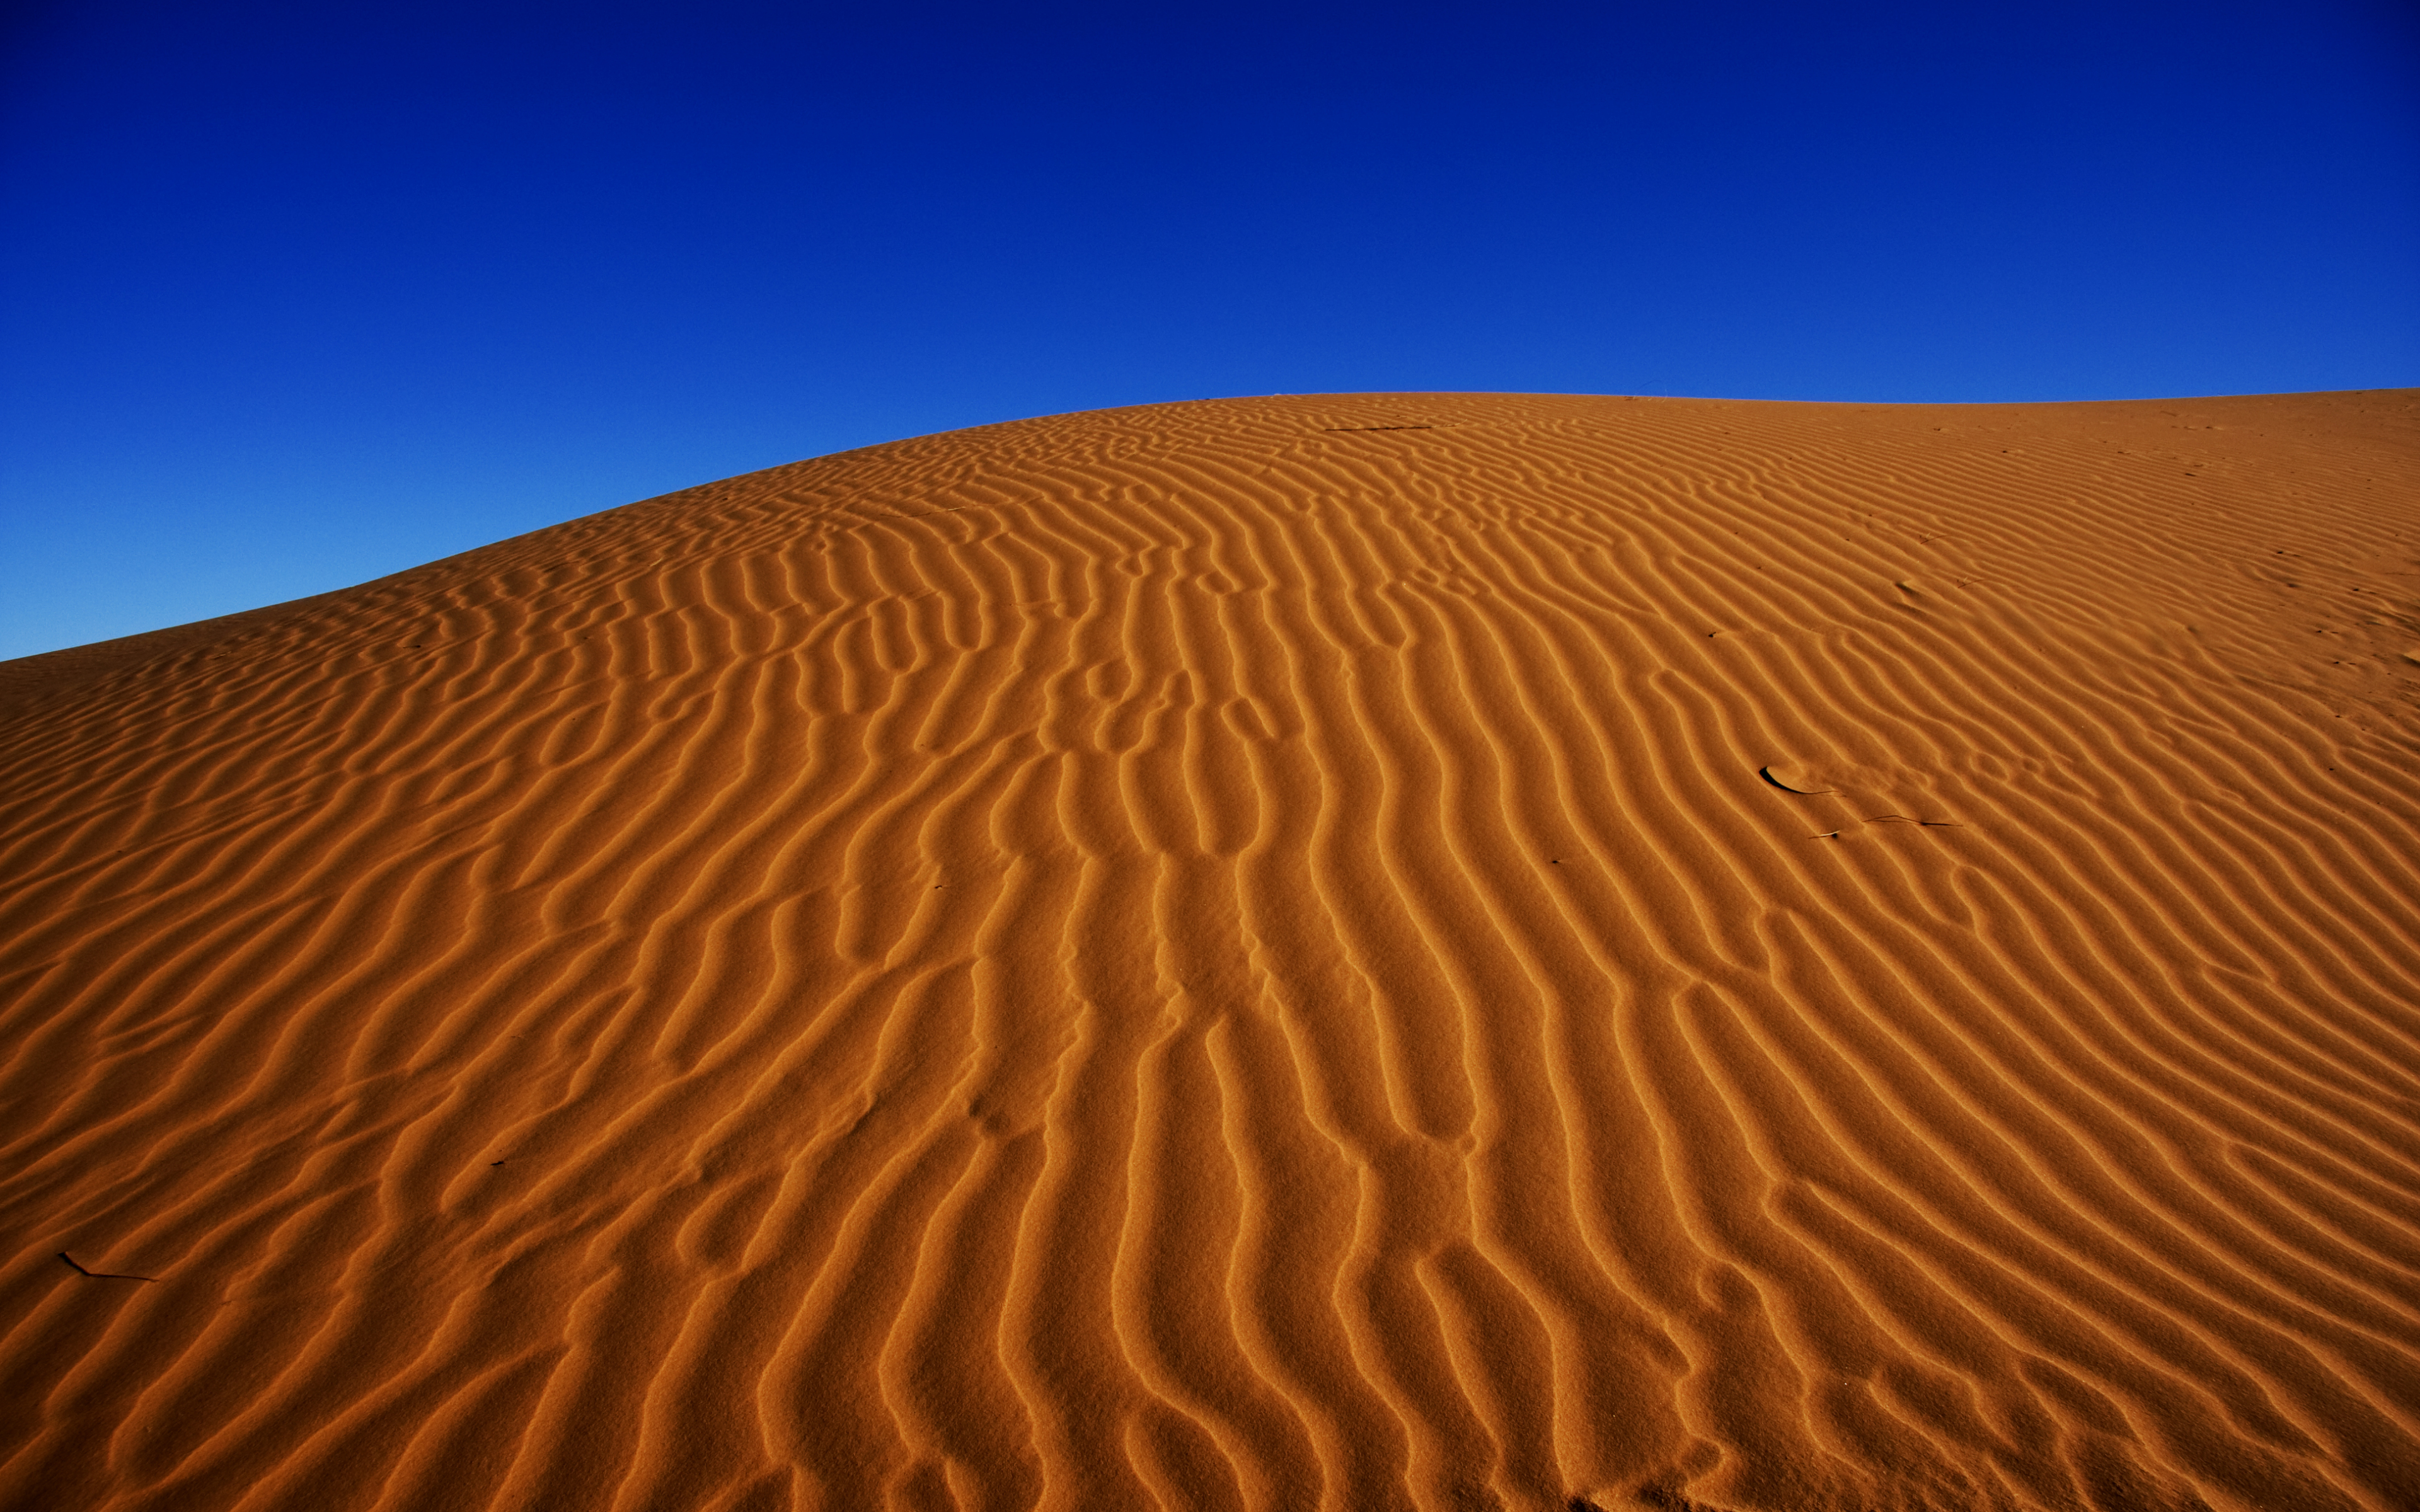 Download 3840x2400 wallpaper desert, nature, sand, dunes ...